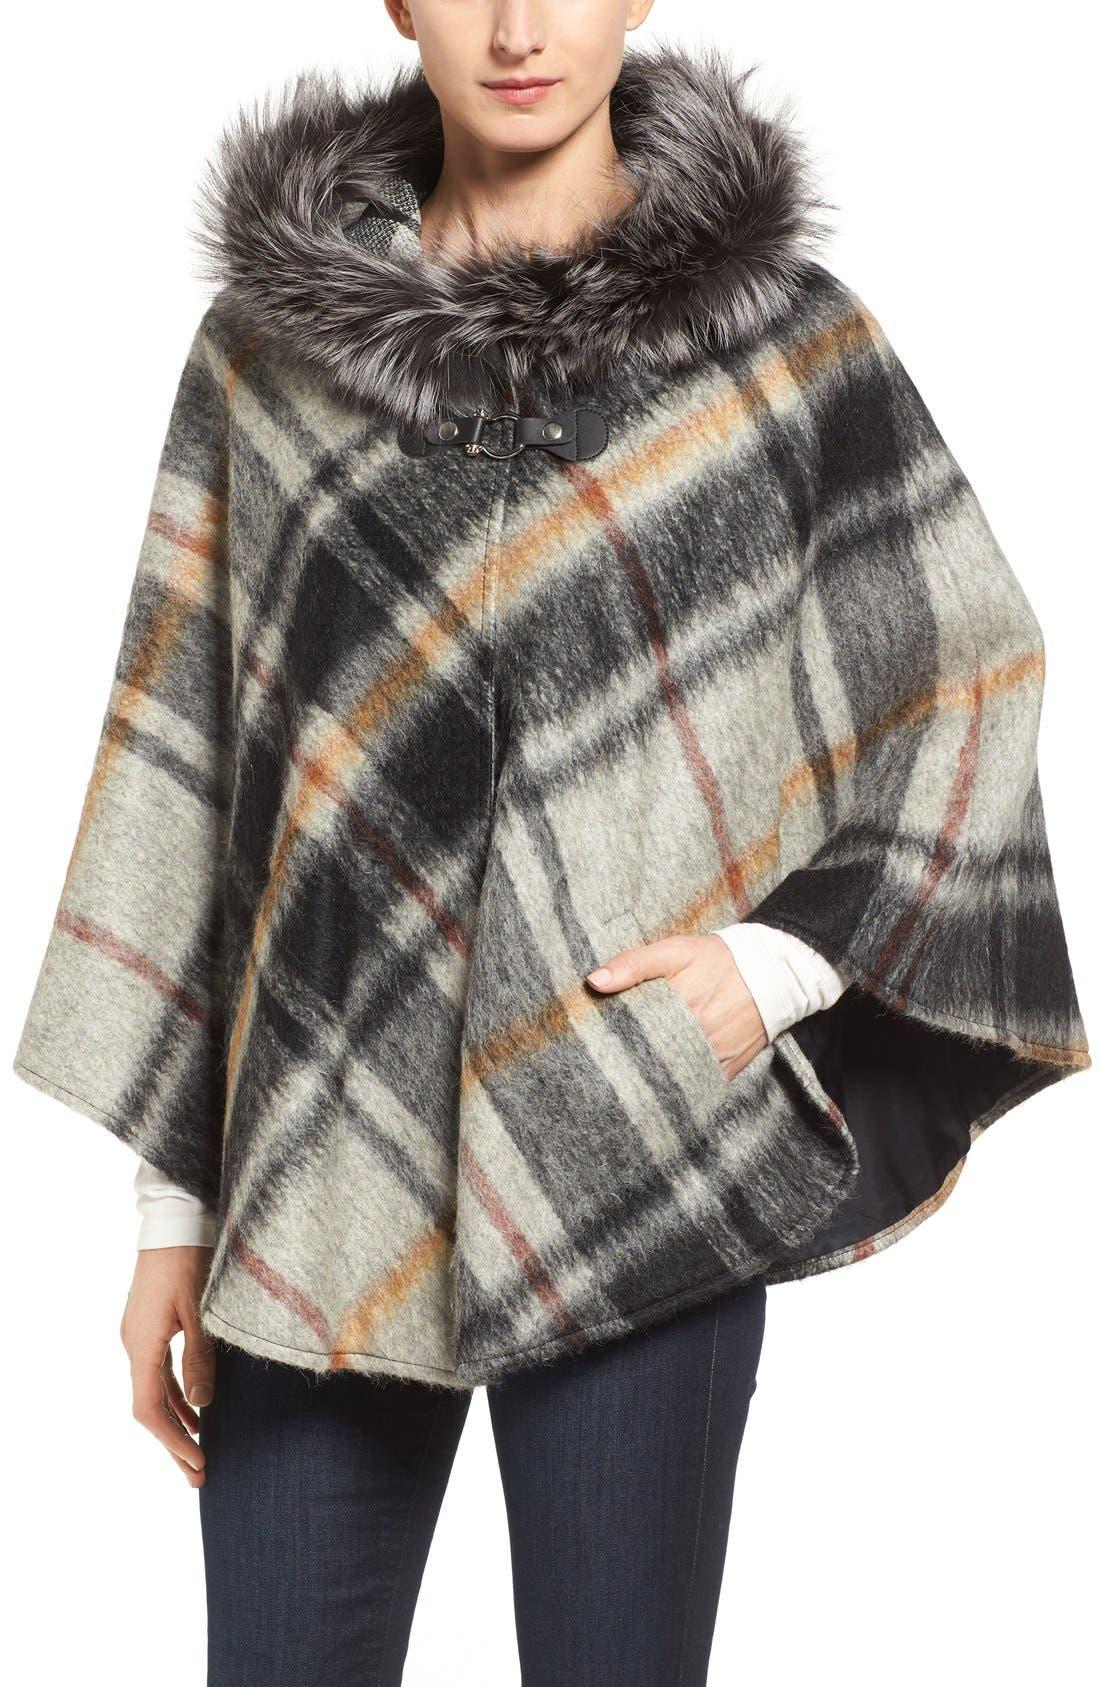 HISO,                             Hide Society Hooded Plaid Cape with Genuine Fox Fur Trim,                             Main thumbnail 1, color,                             020